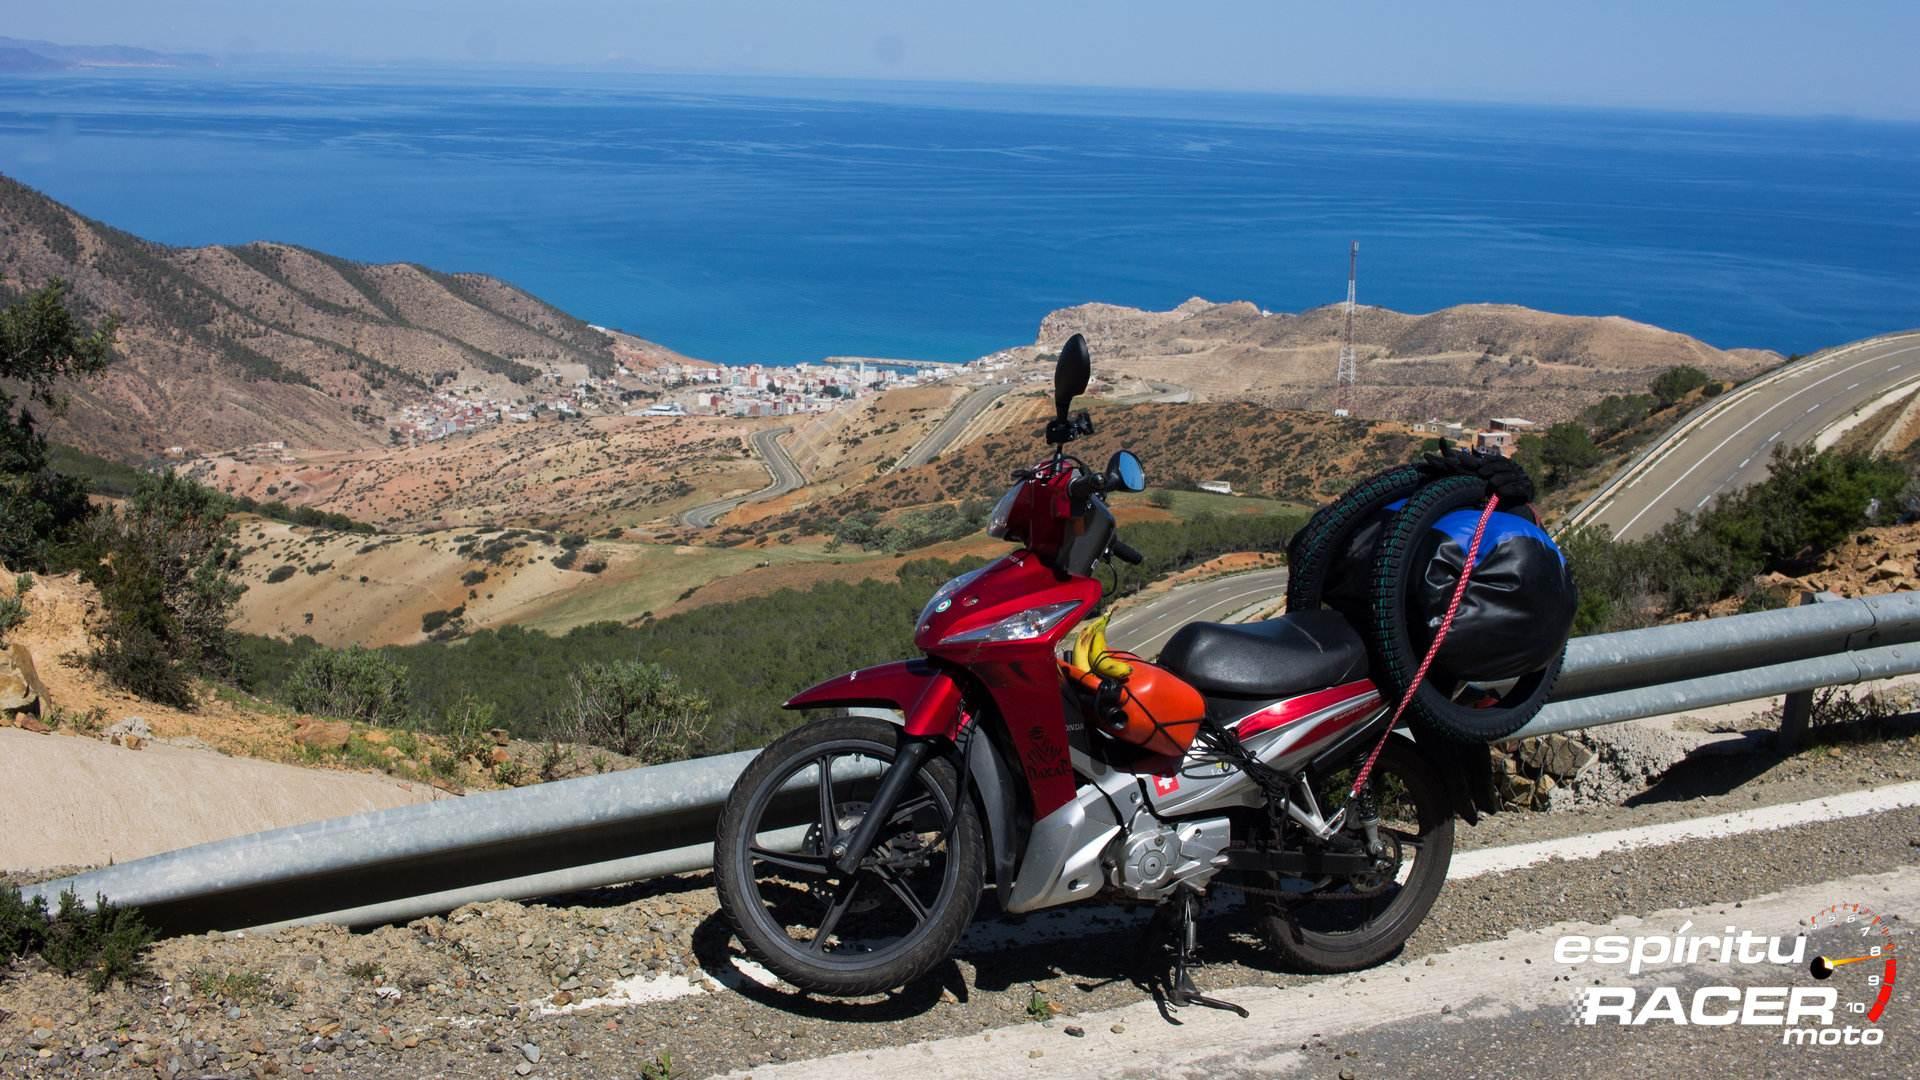 Marruecos En Moto 68